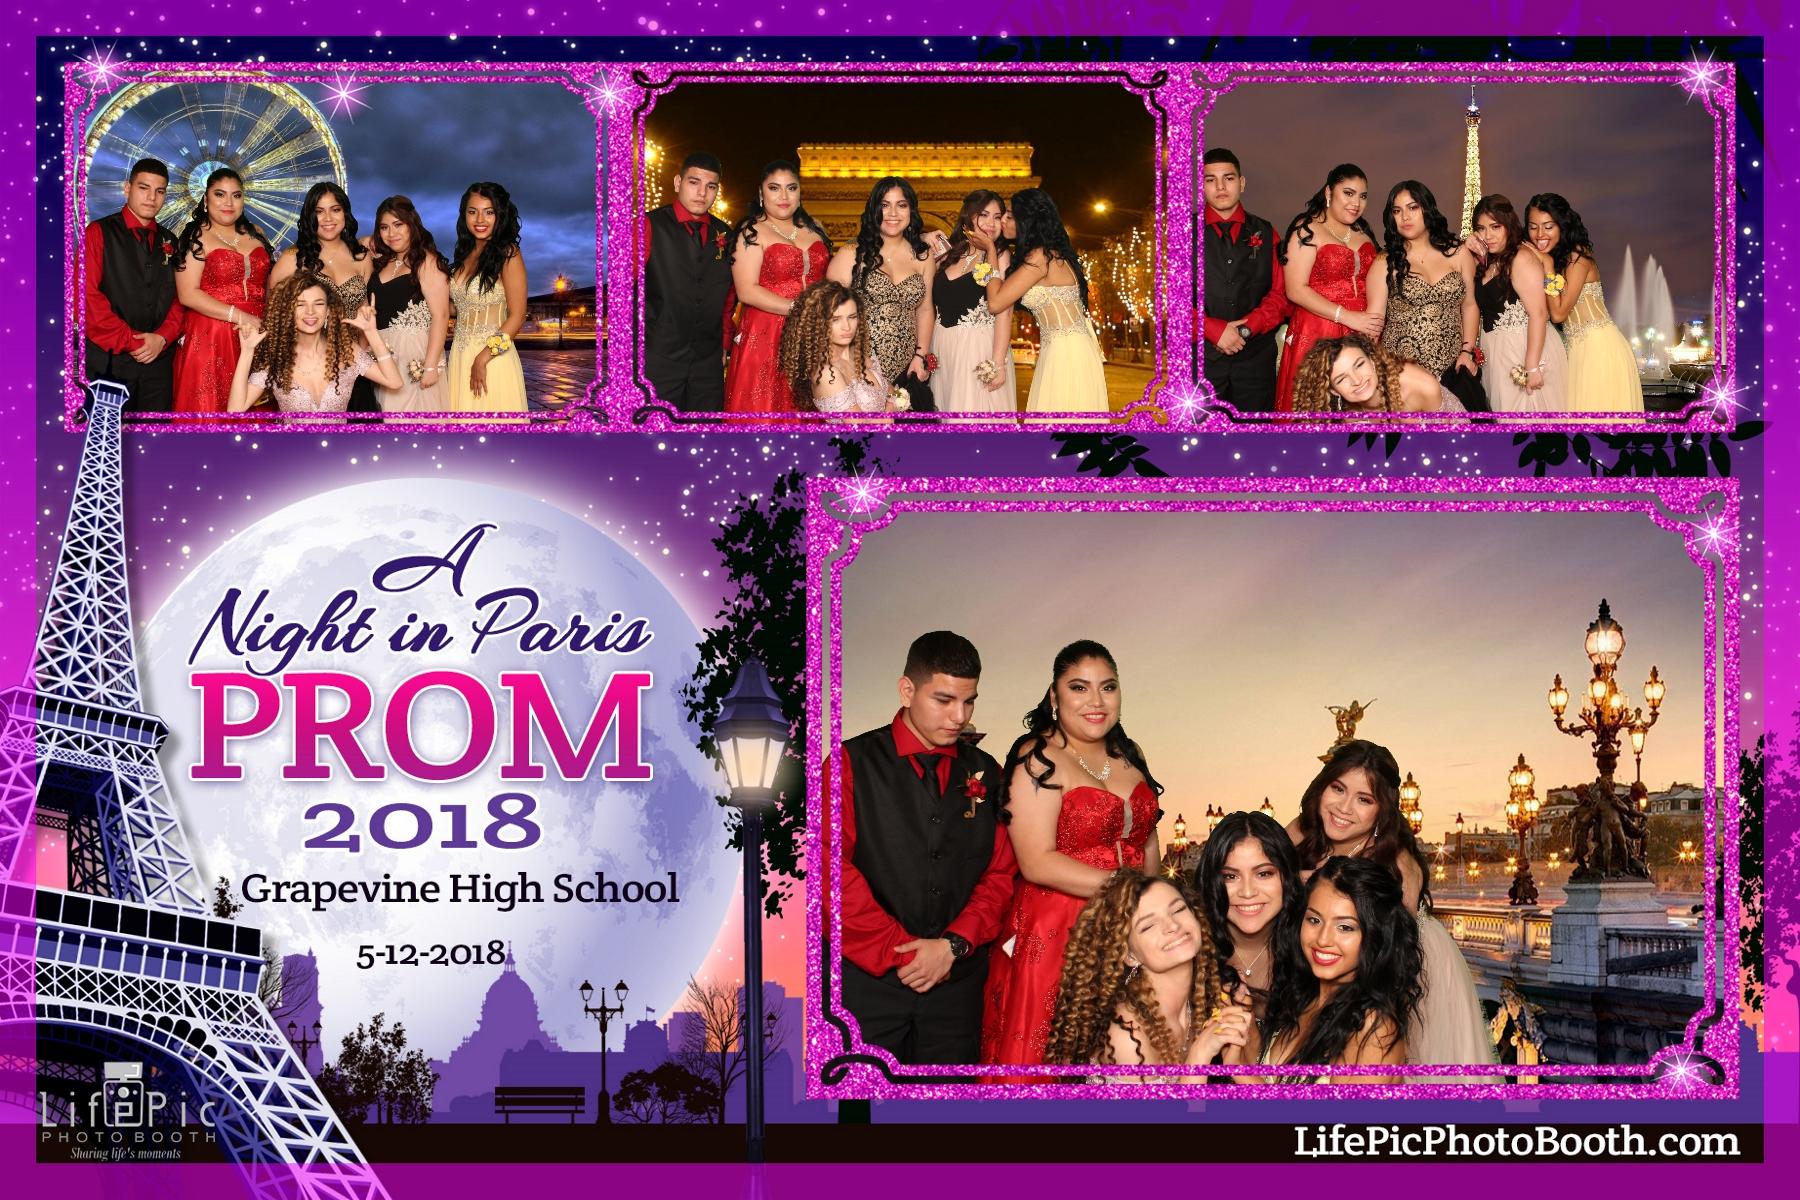 Grapevine High School Prom_2018-05-12_22